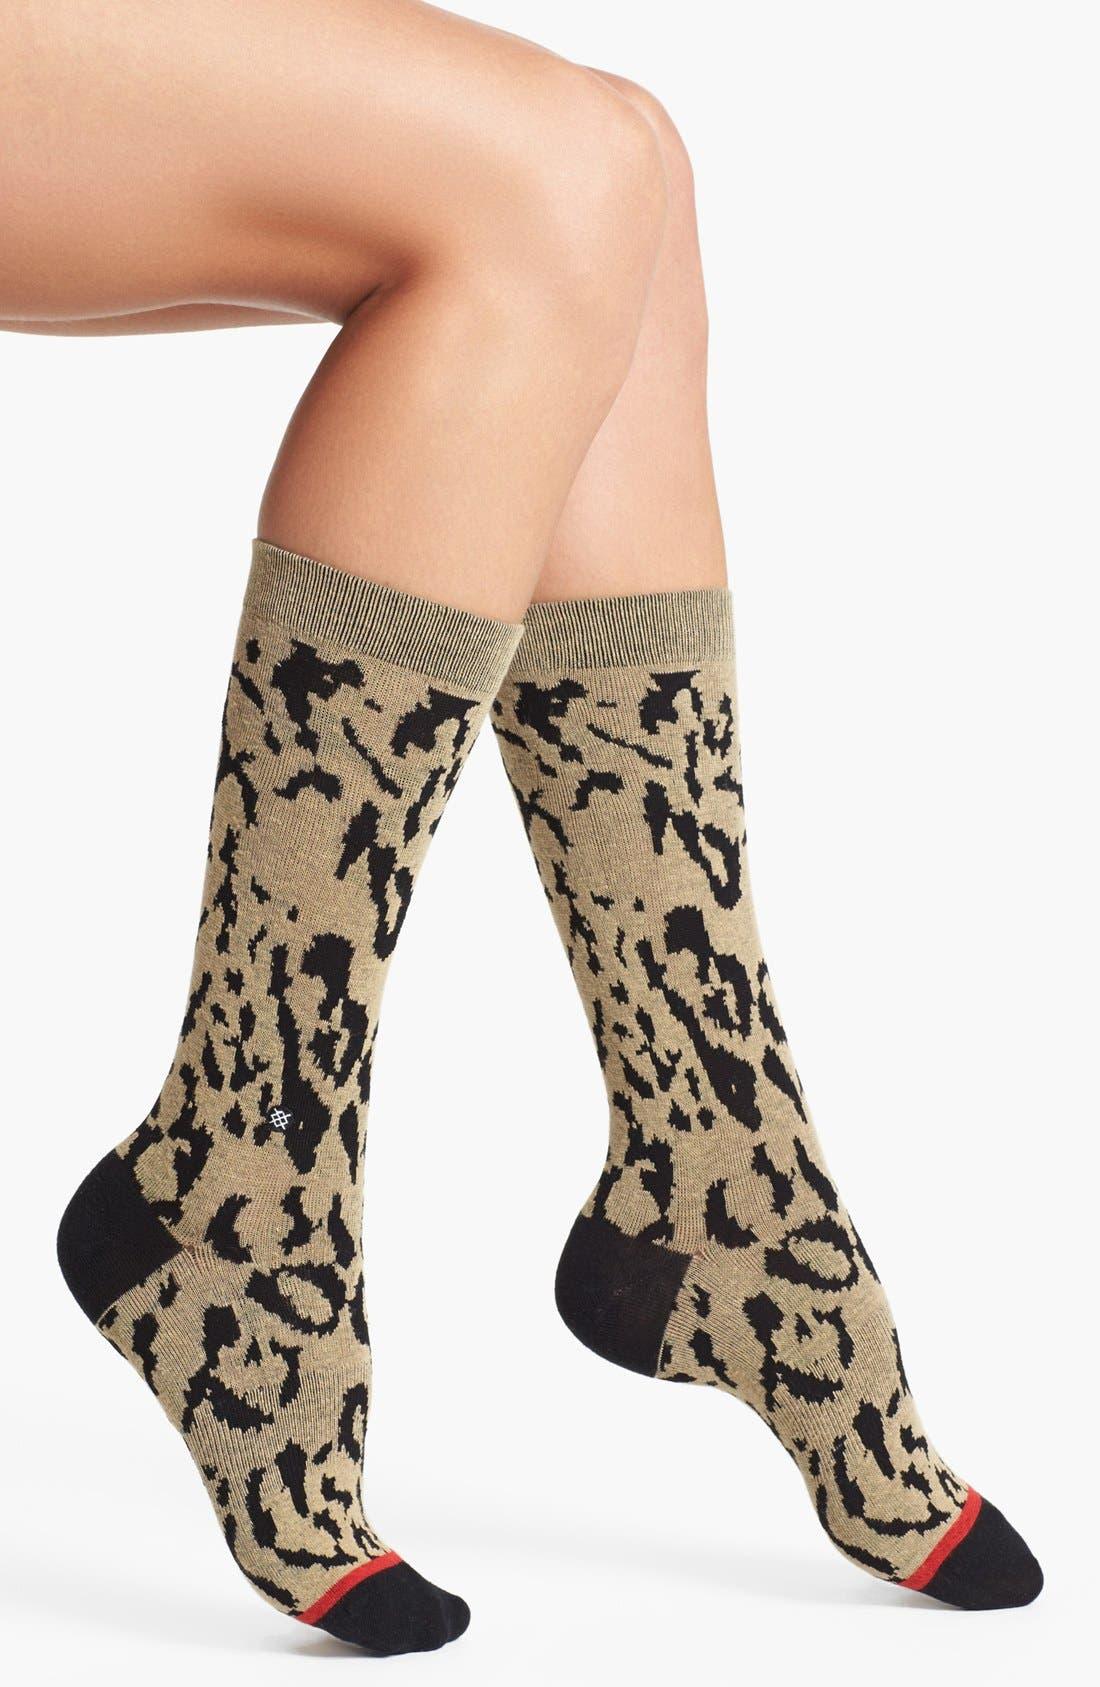 Alternate Image 1 Selected - Stance 'Cheetah' Crew Socks